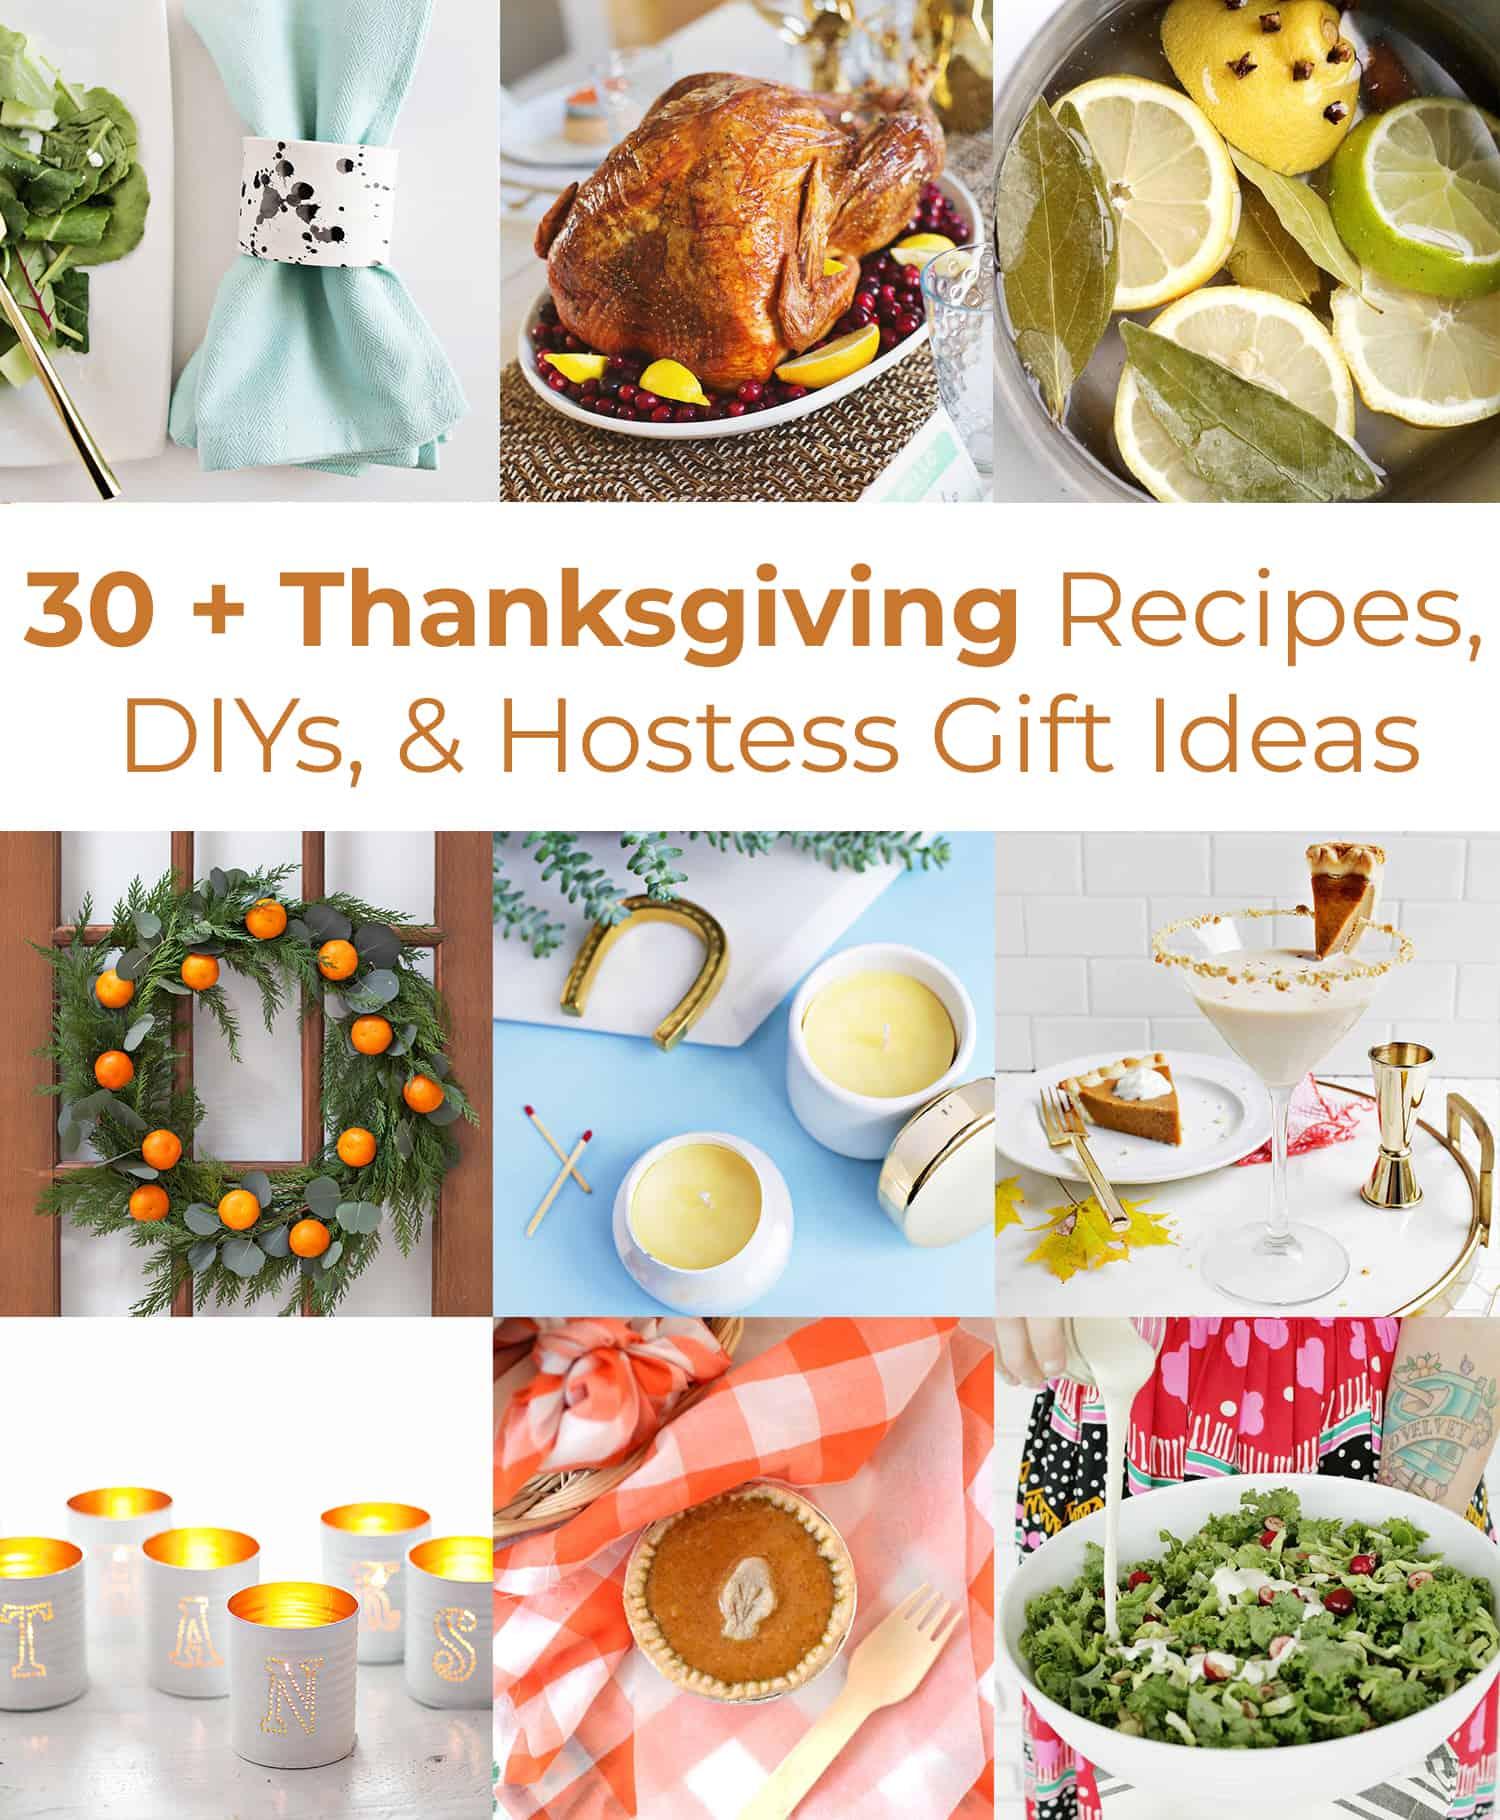 30+ Thanksgiving Recipes, DIYs, & Hostess Gifts - A Beautiful Mess